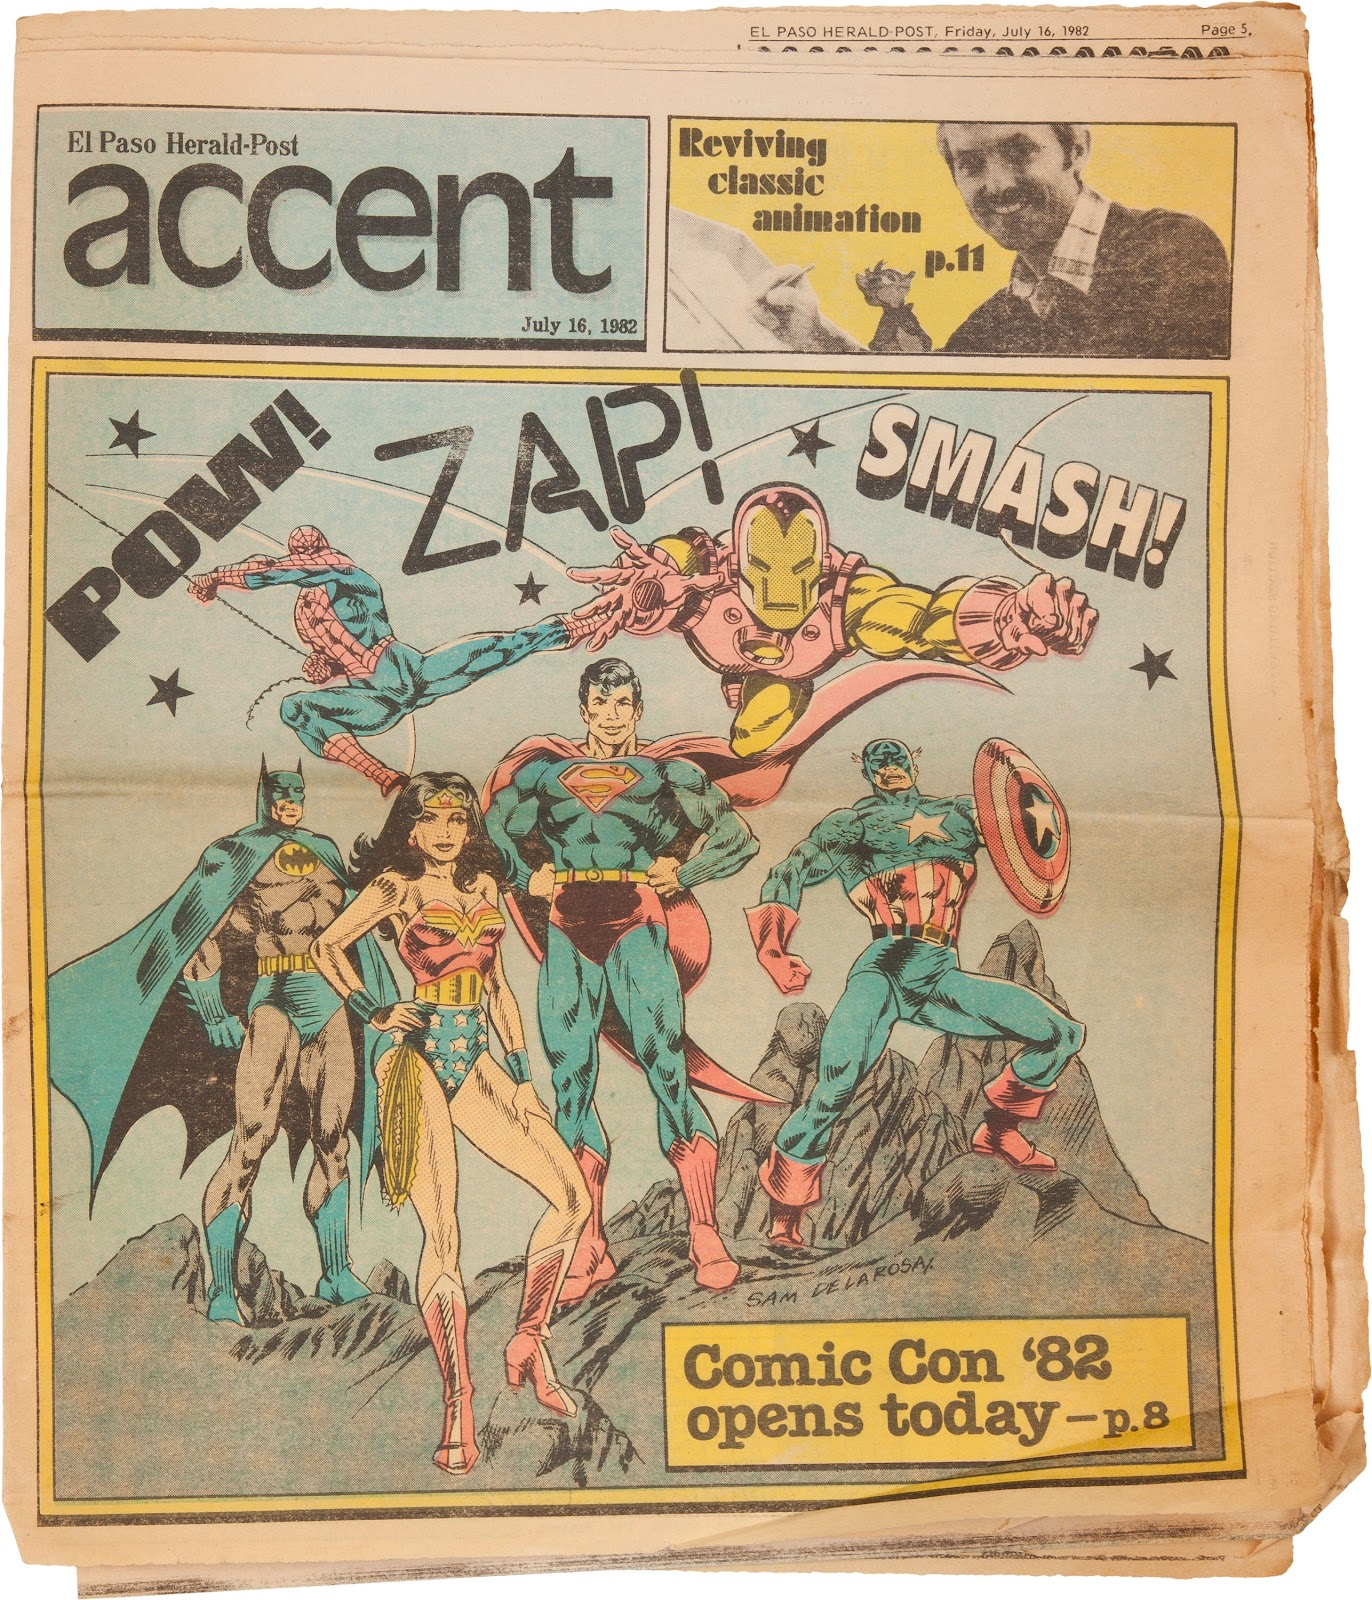 Comic Strip Comedy Club El Paso, TX 79925 - YPcom